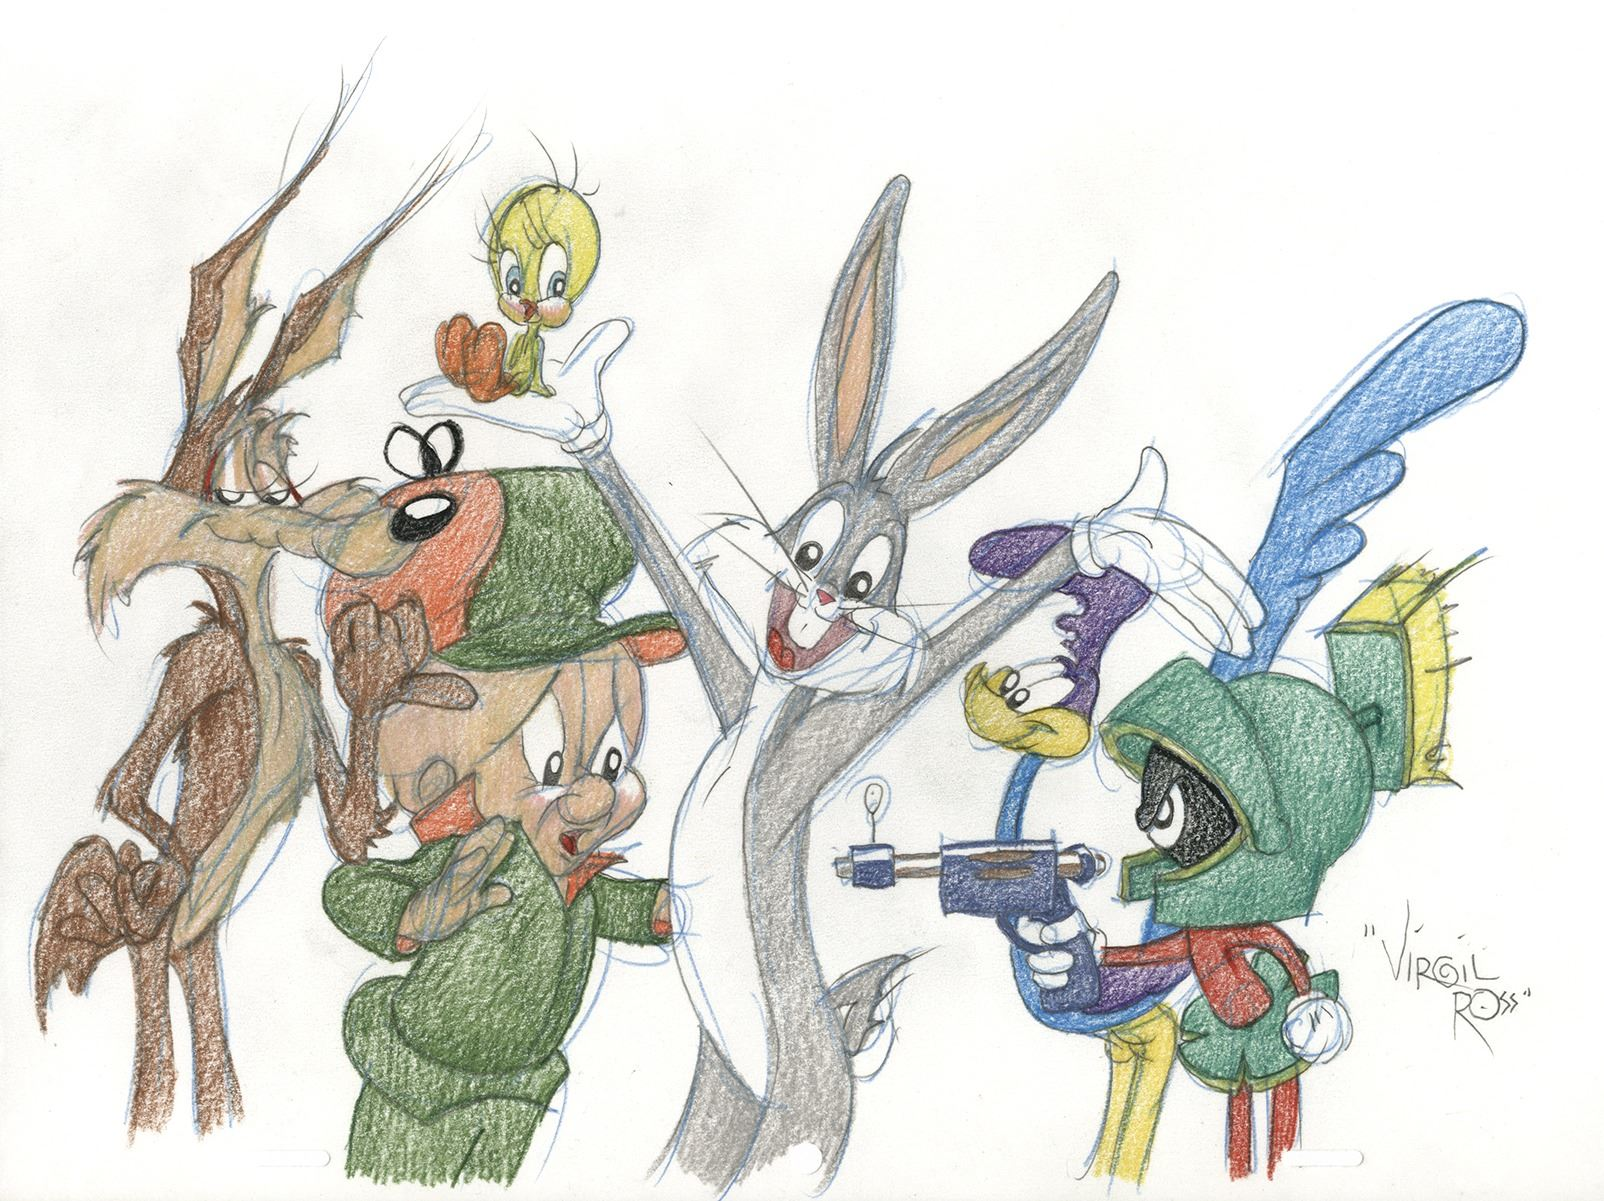 Image 1 virgil ross original drawing of warner bros characters